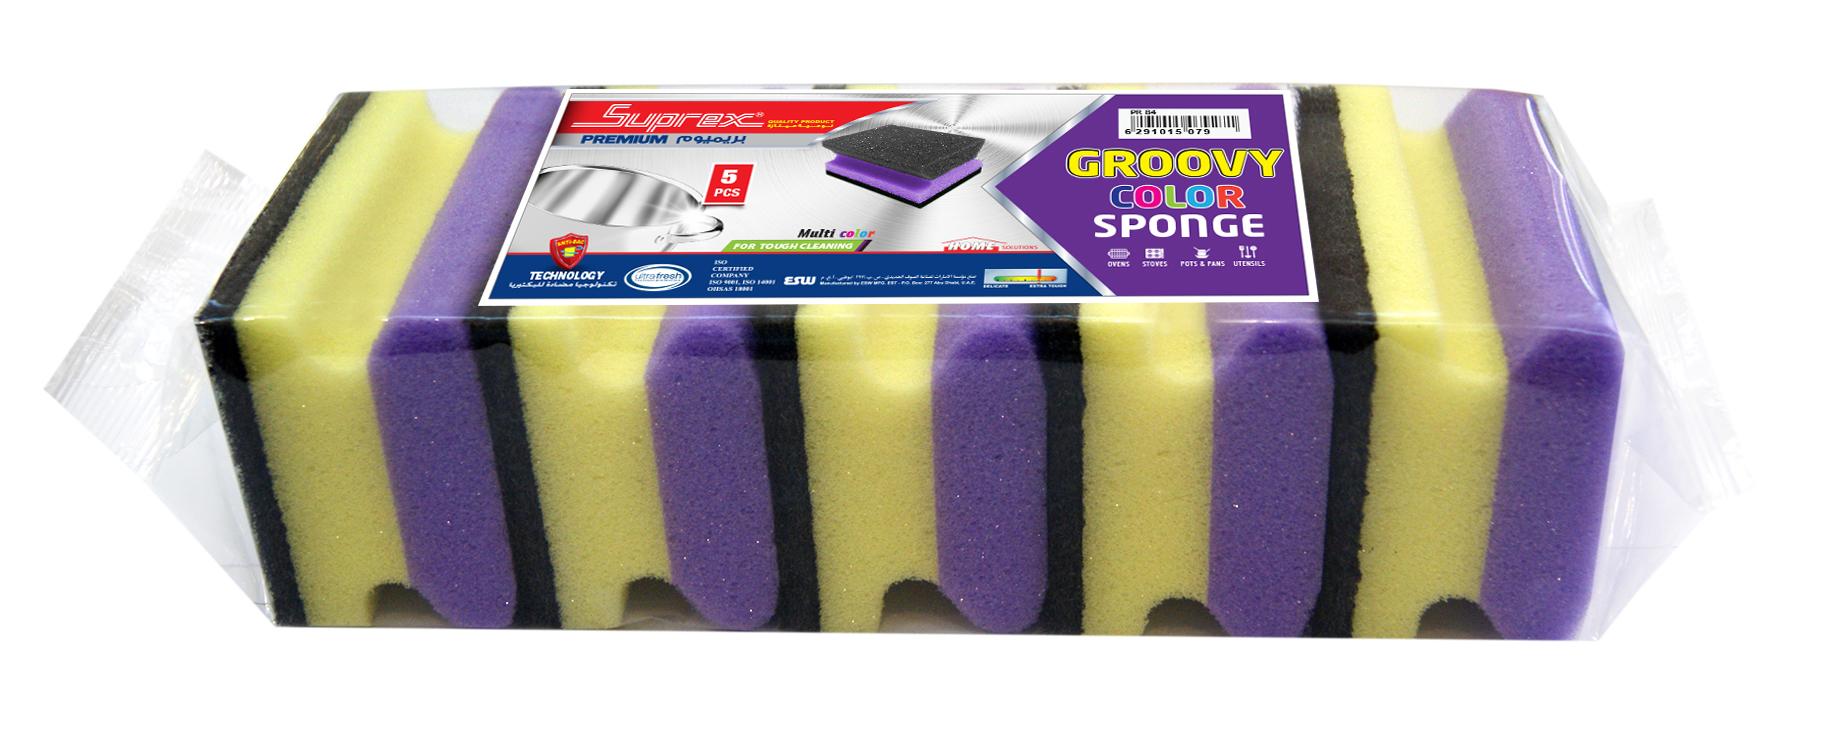 Groovy Color Sponge